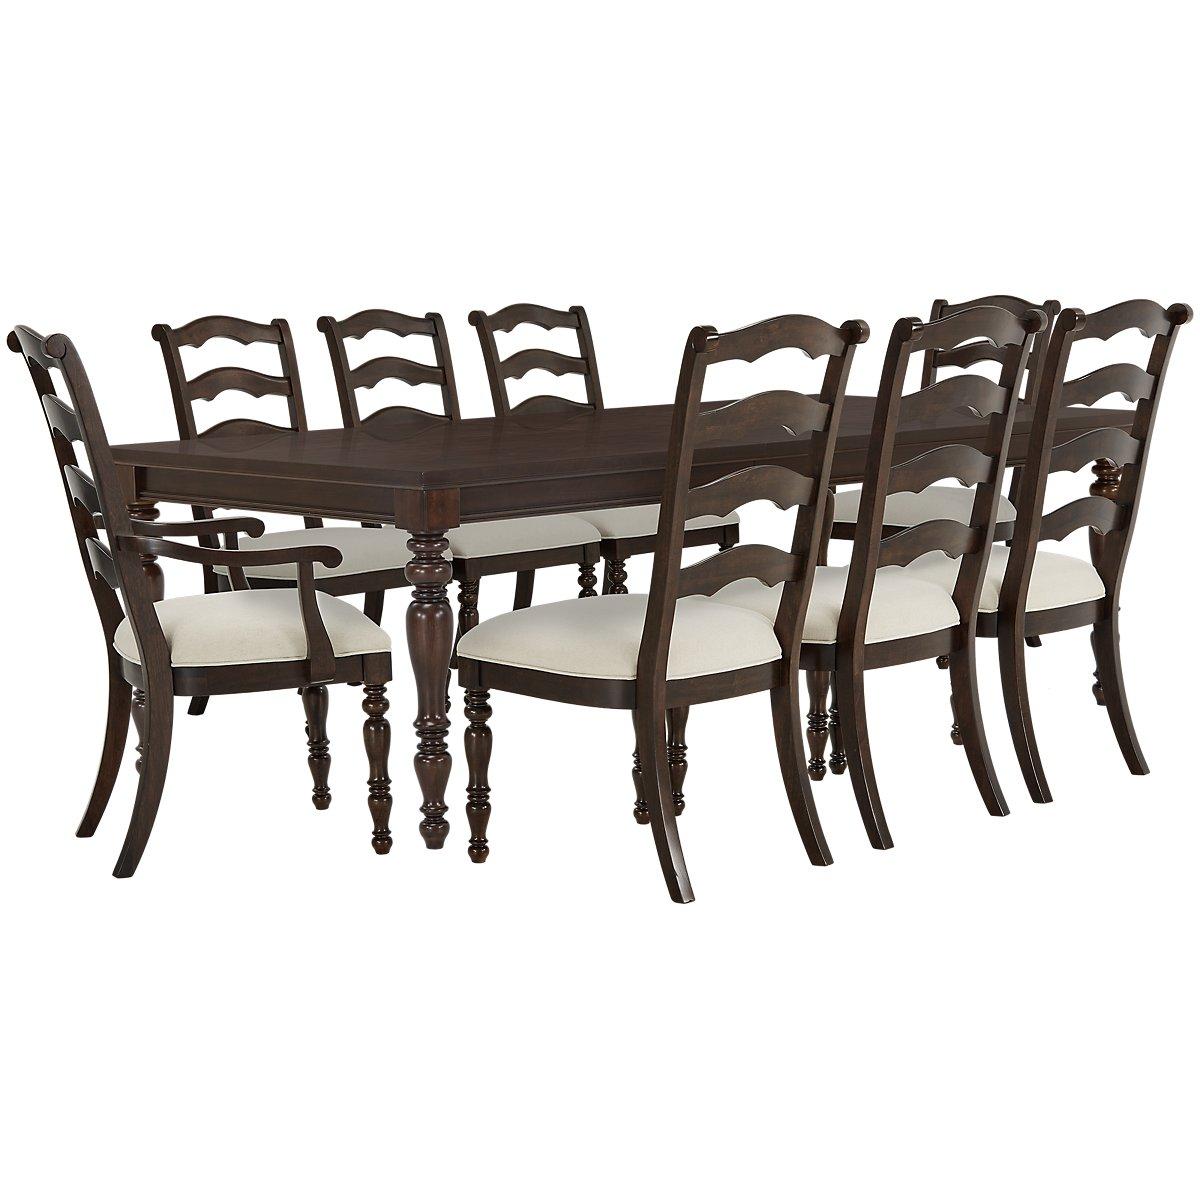 Savannah Dark Tone Wood Rect Table & 4 Chairs